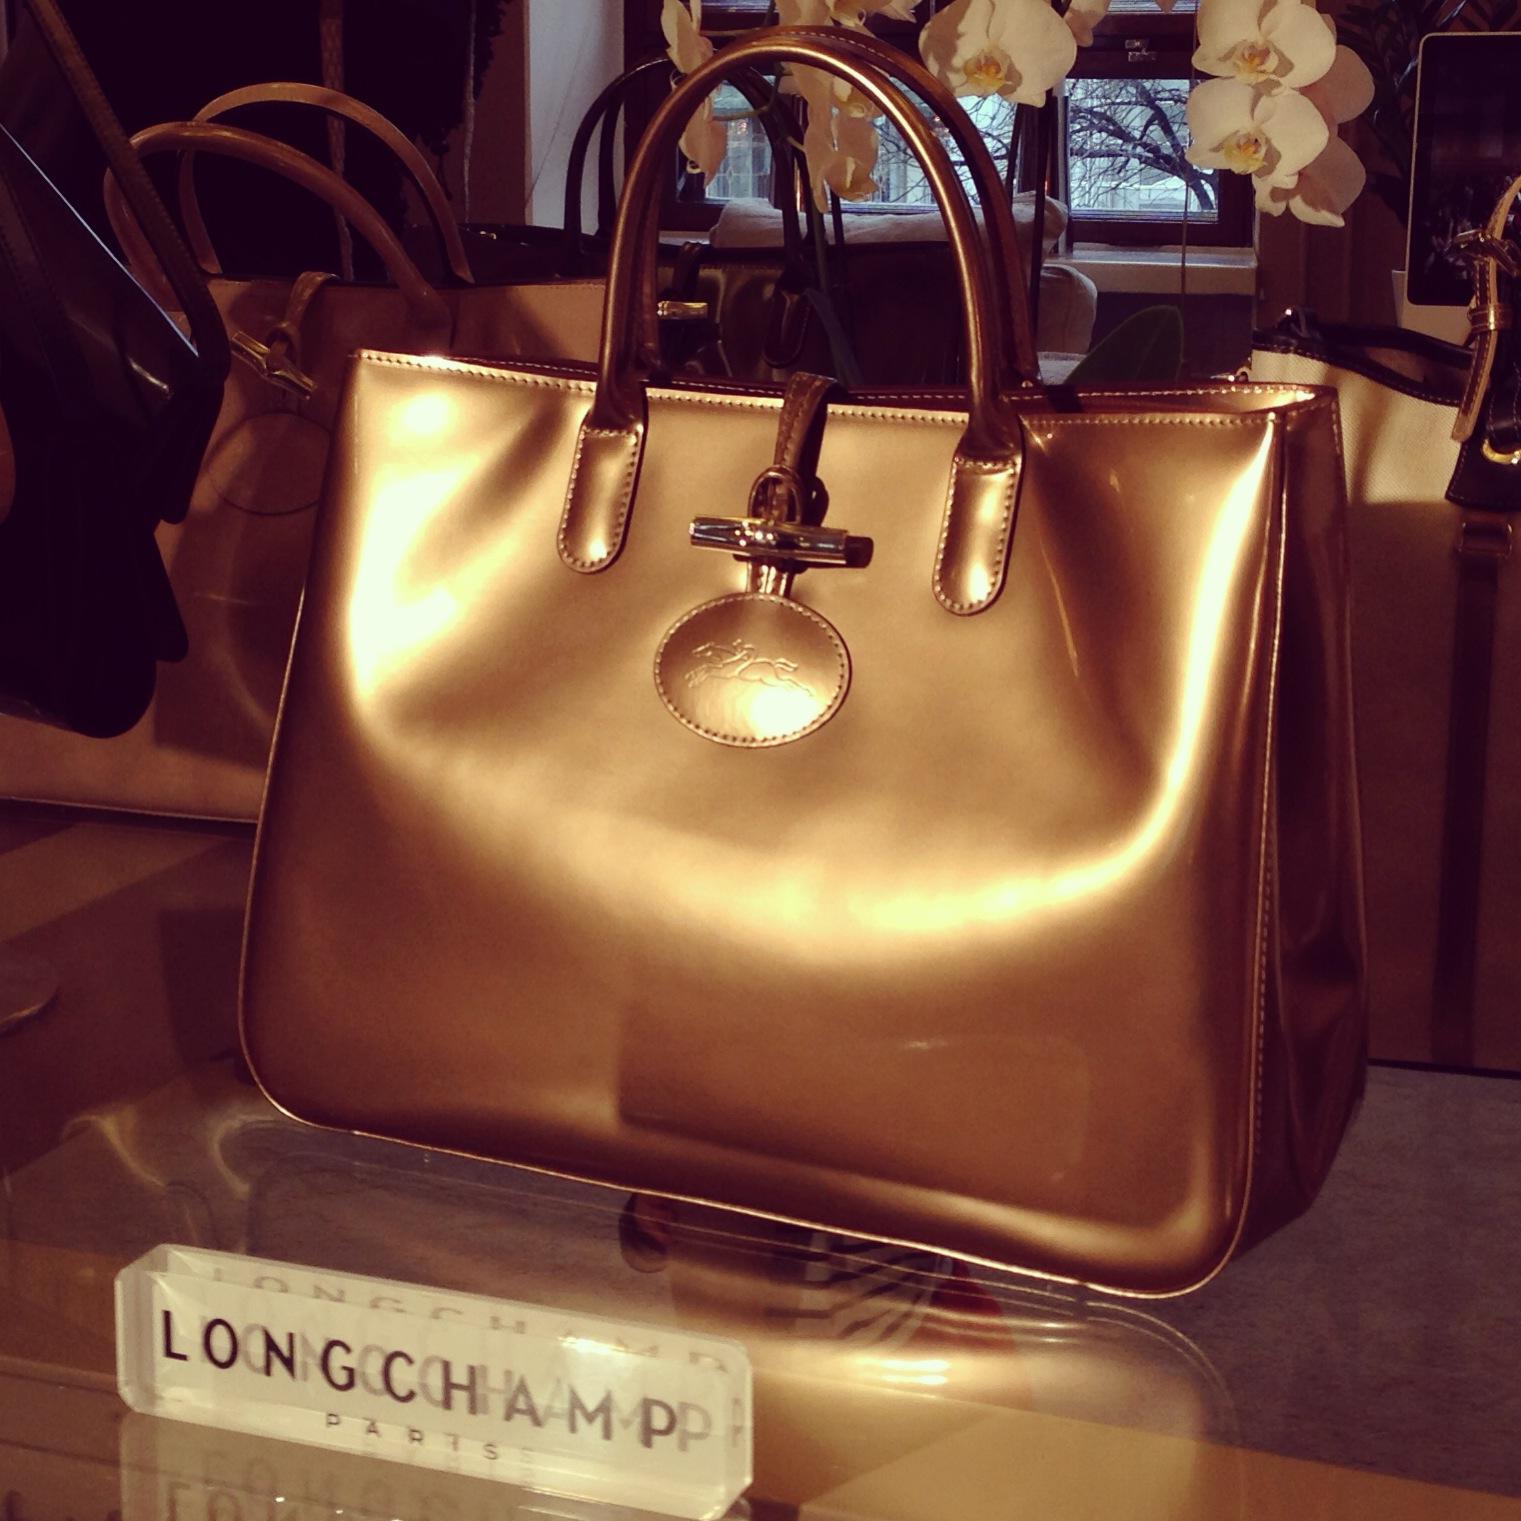 Box Roseau Longchamp Longchamp Longchamp Roseau Roseau Box Longchamp Roseau Box Iy6vg7bmYf